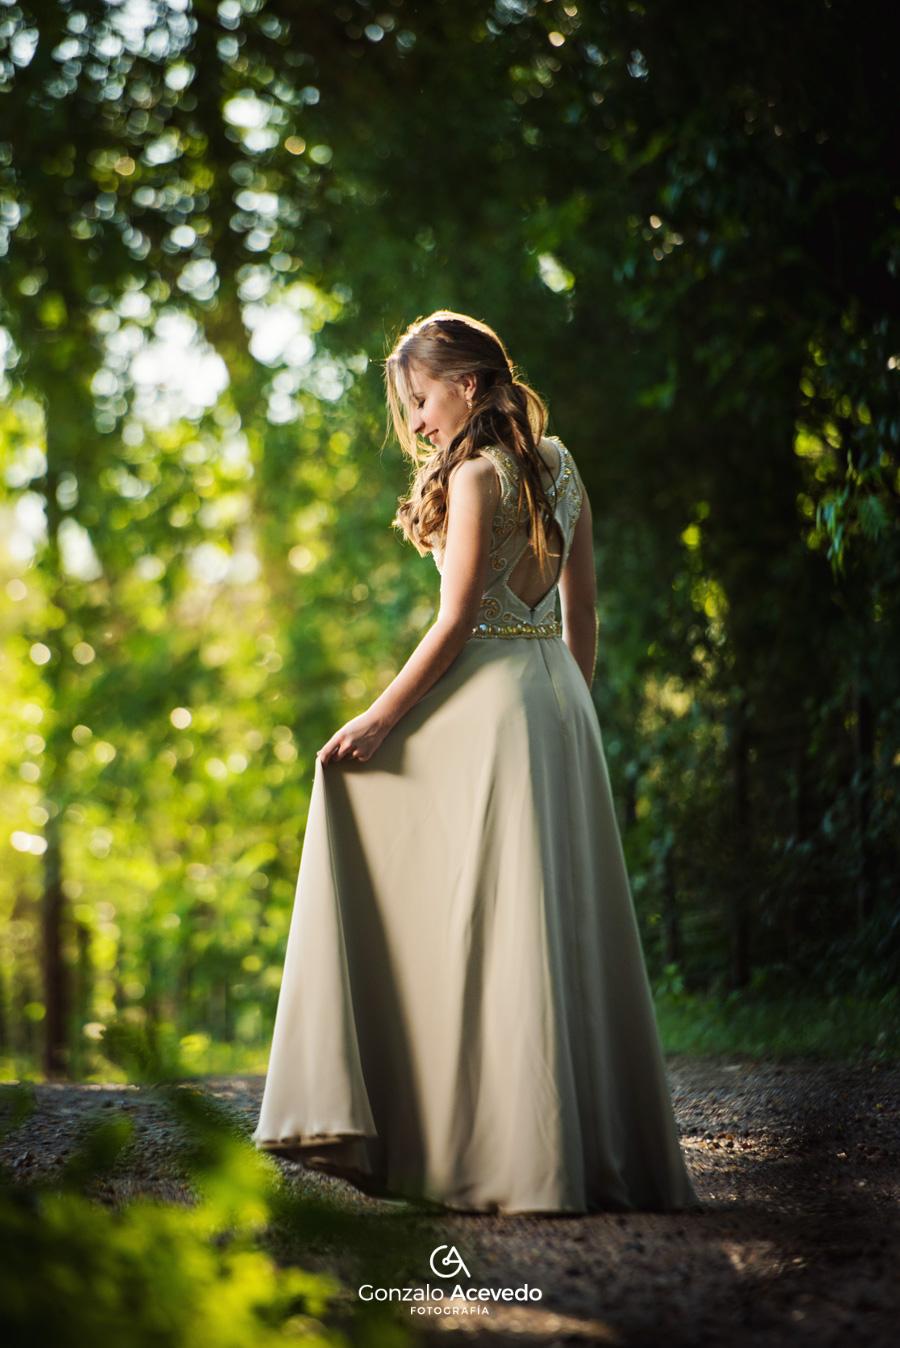 Pau book de 15 trash the dress fifteens vestido dia natural campo ideas geniales originales #gonzaloacevedofotografia gonzalo acevedo